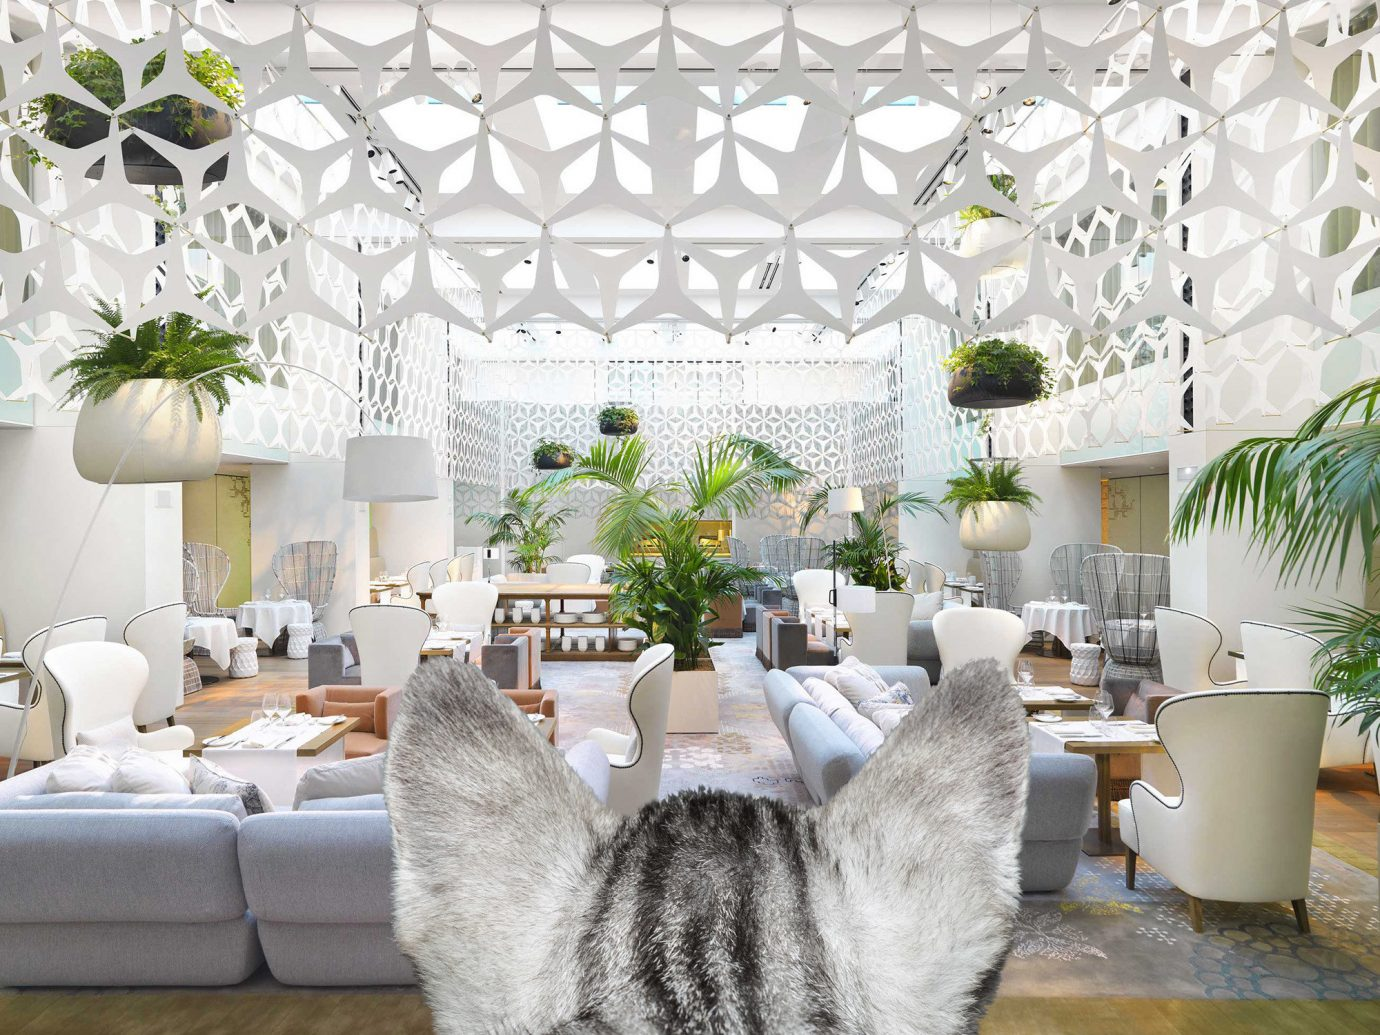 Hotels cat indoor white room window floristry living room interior design home Design textile